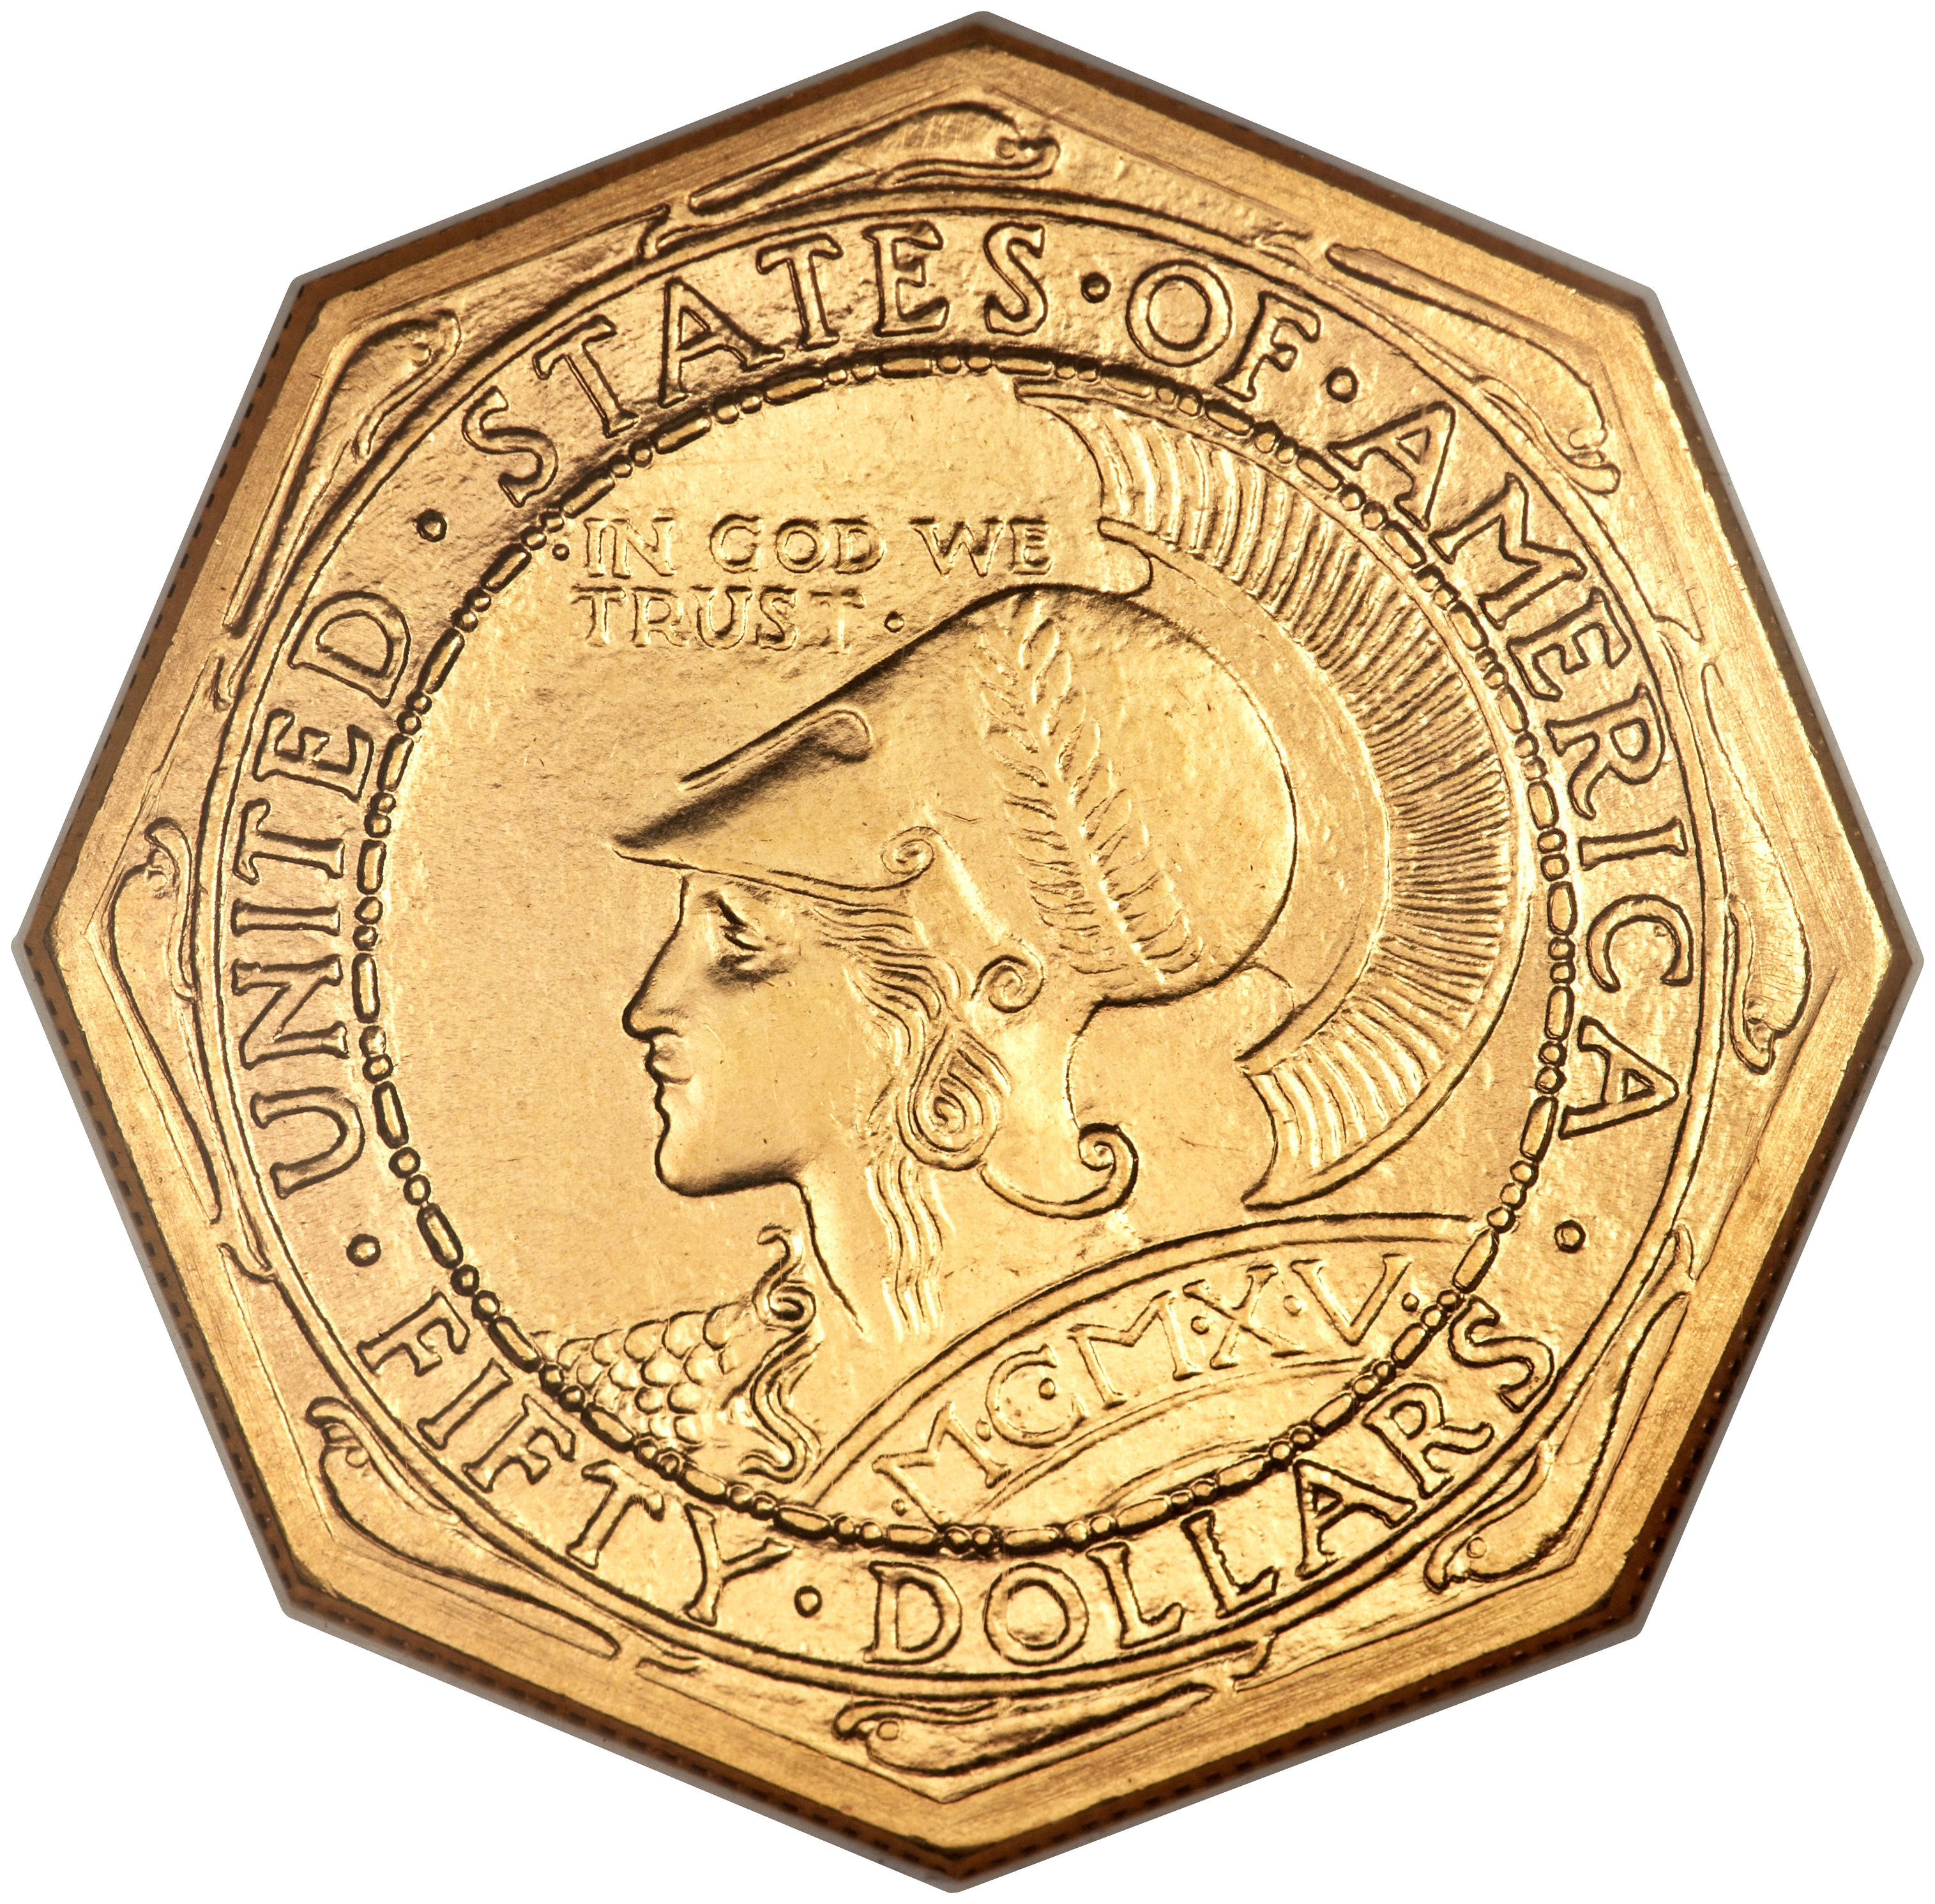 Background image 50 transparent - File 1915 S 50 Panama Pacific 50 Dollar Octagonal Obv Transparent